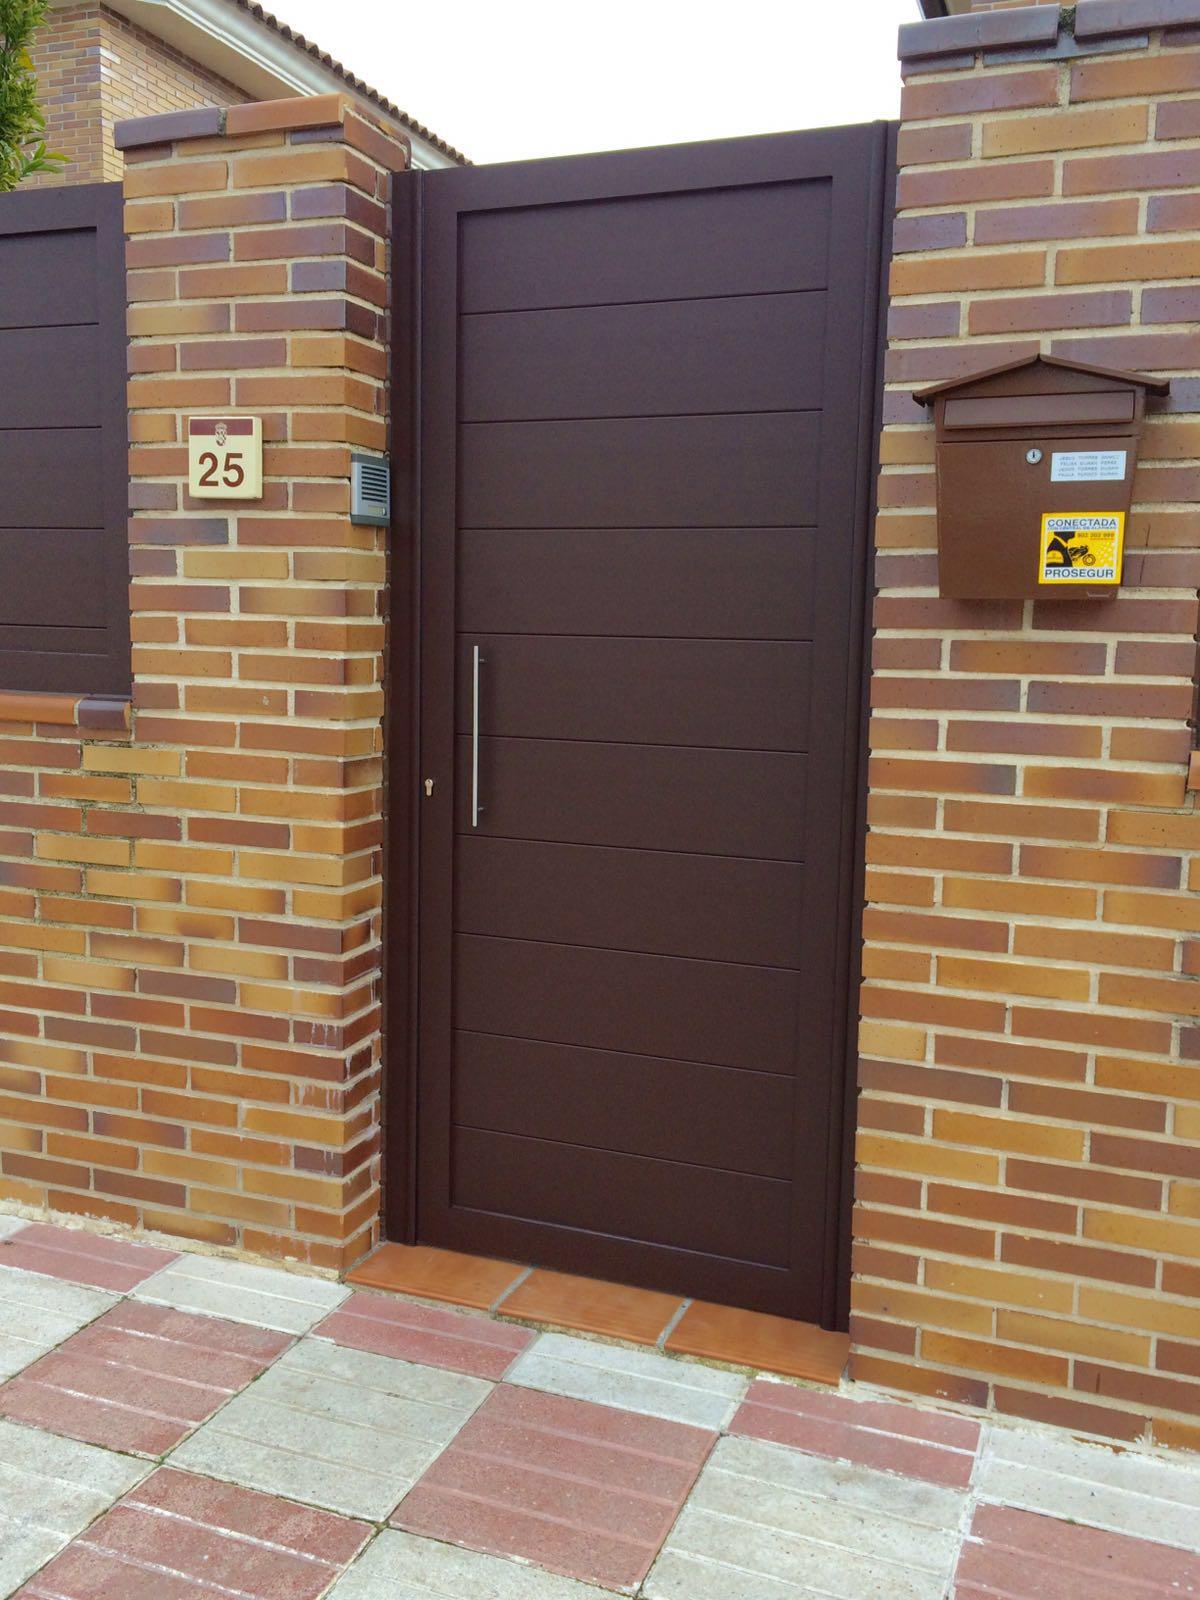 Puertas de aluminio para exterior modelo gri on - Puertas de exterior metalicas ...